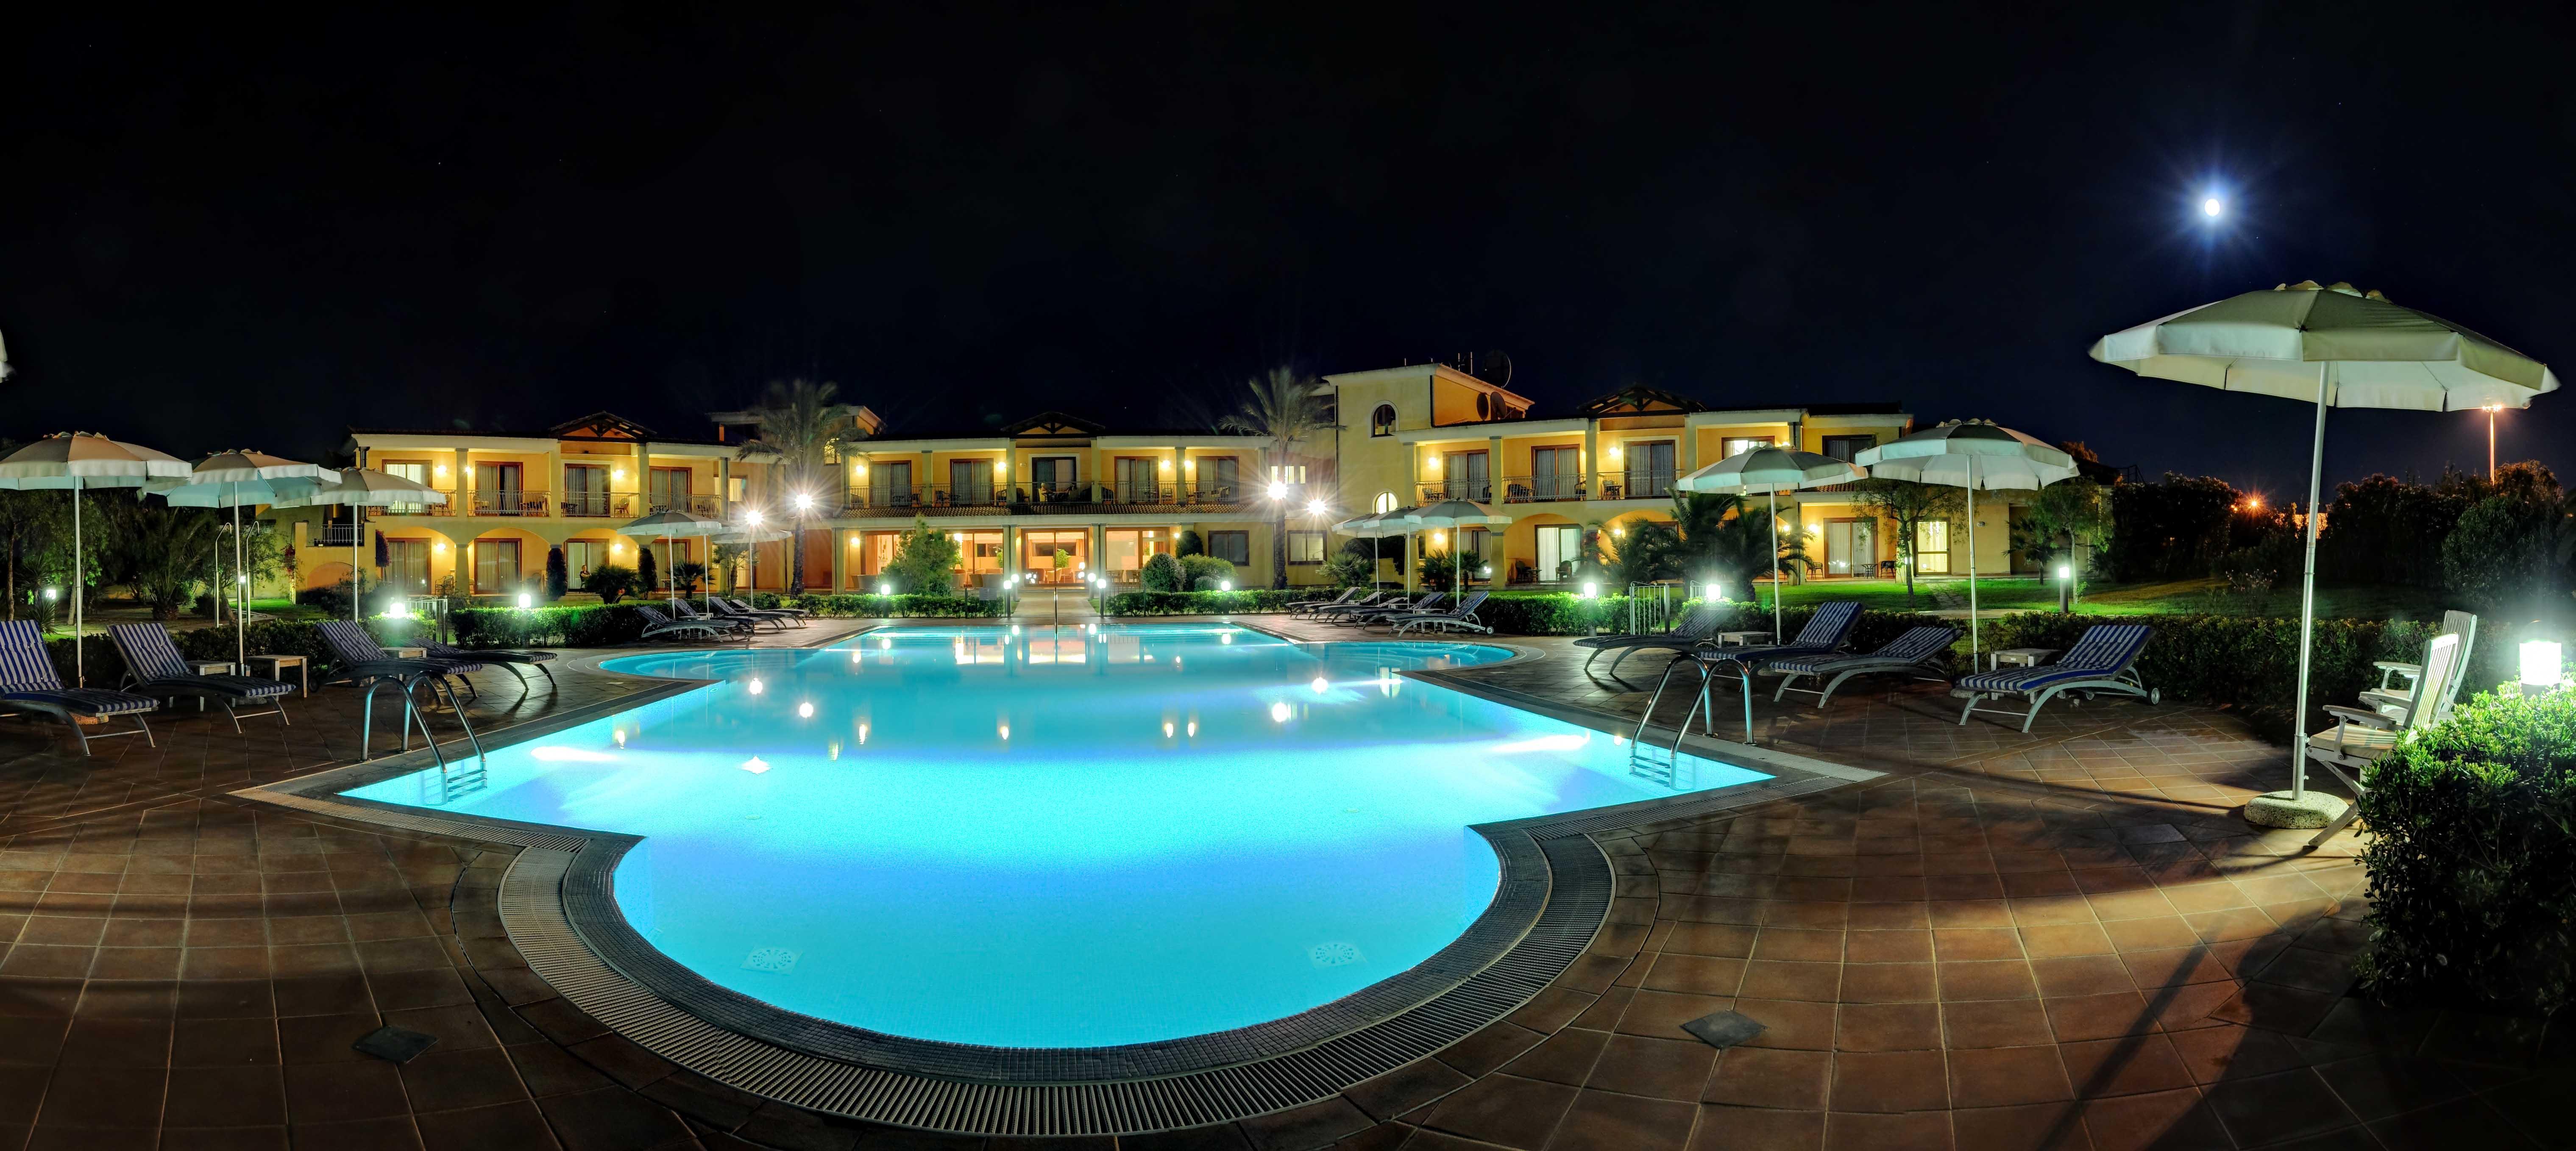 Hotel santa lucia capoterra capoterra sardegna prenota for Piscina santa lucia